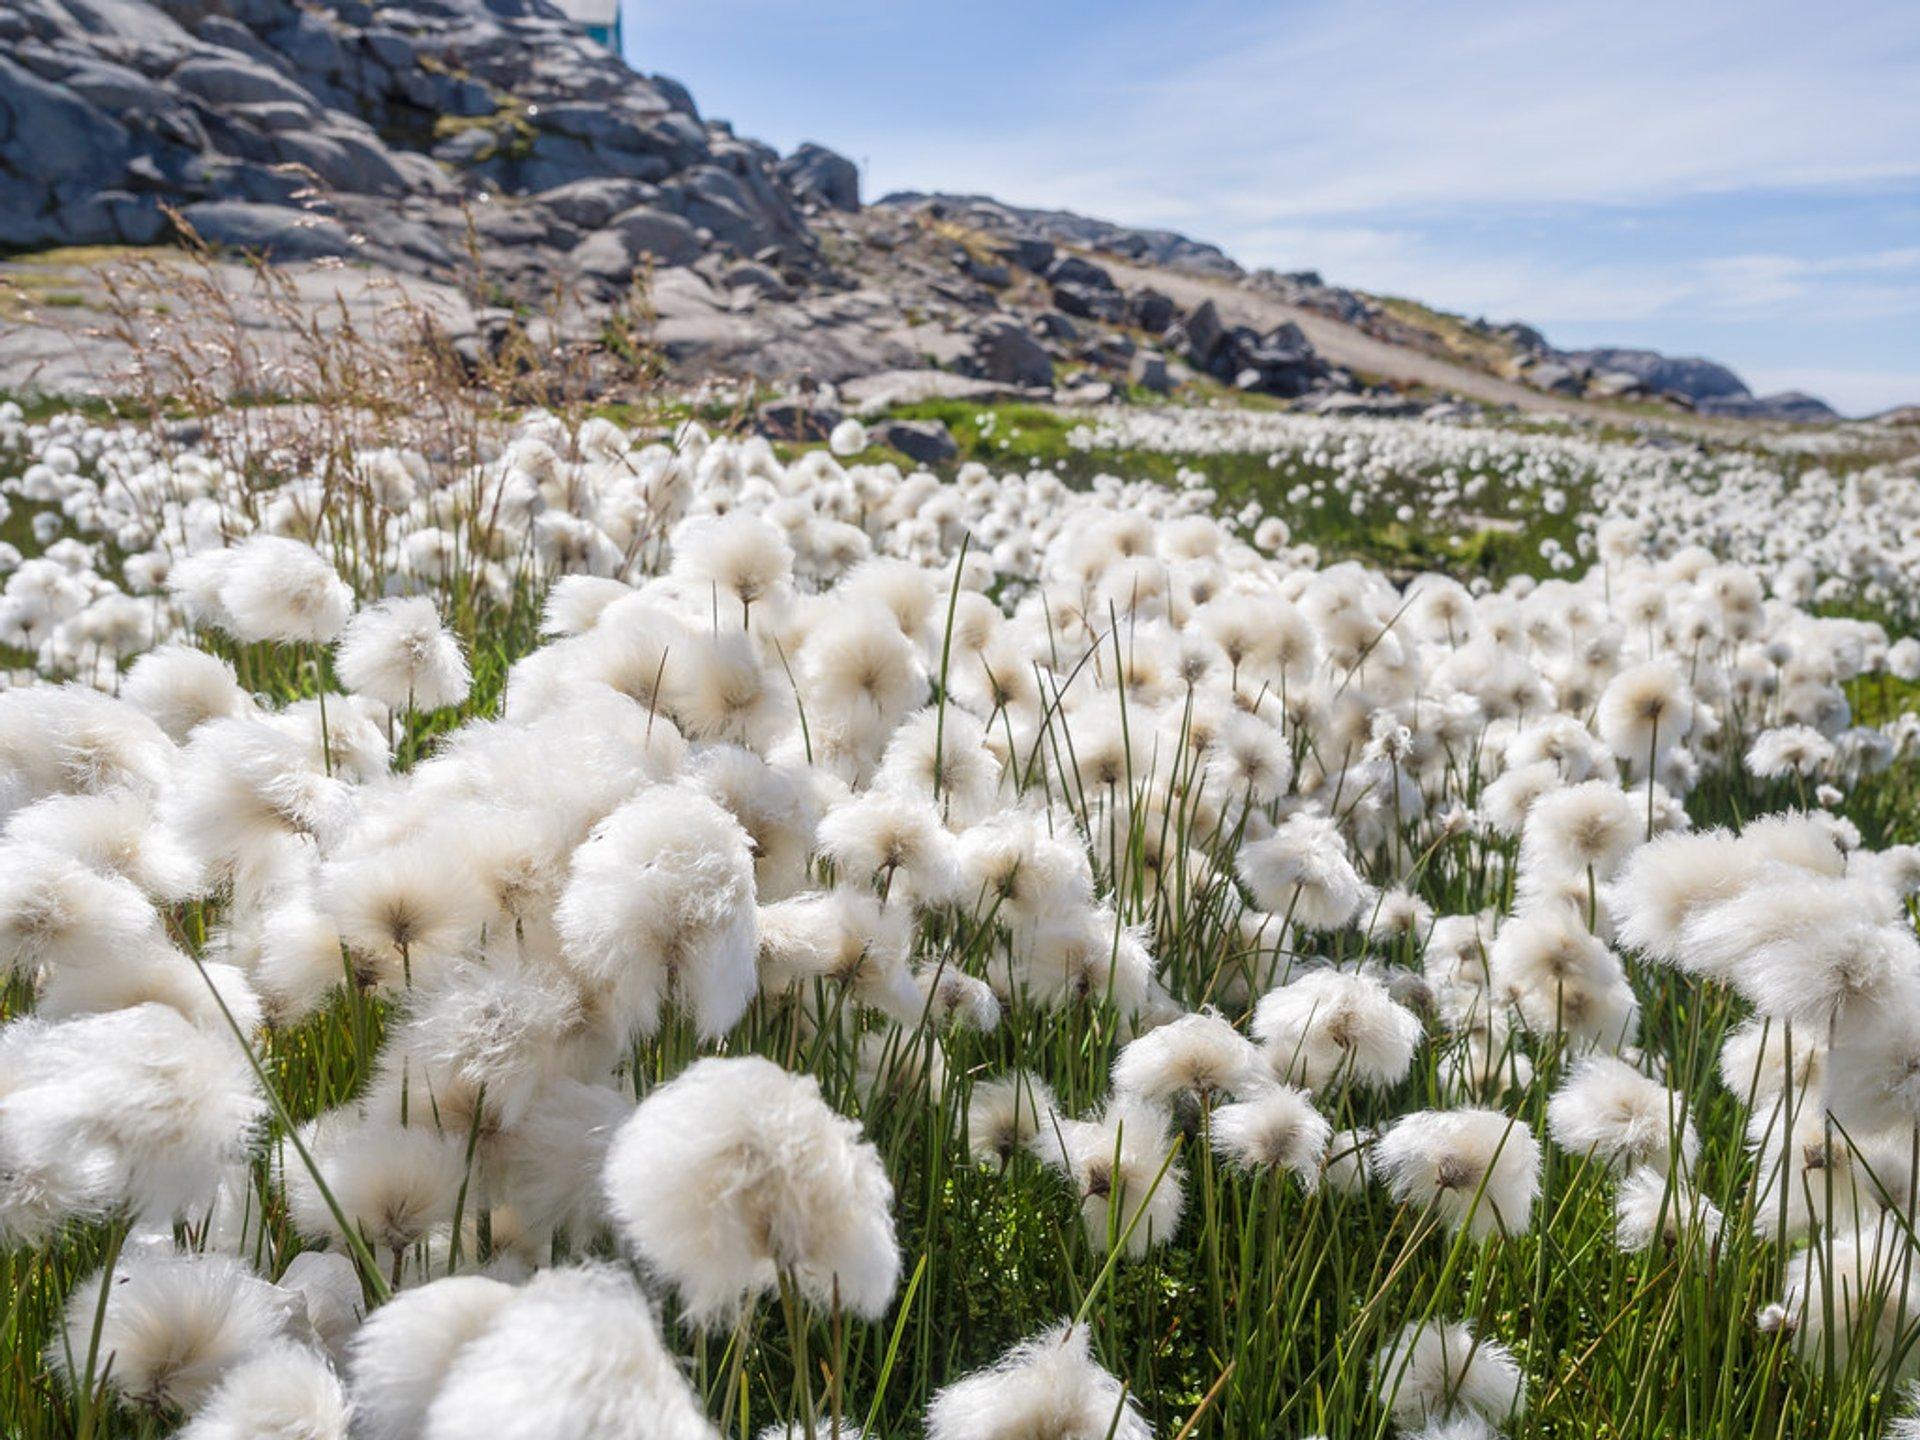 Cotton grass in Kulusuk, Greenland 2020